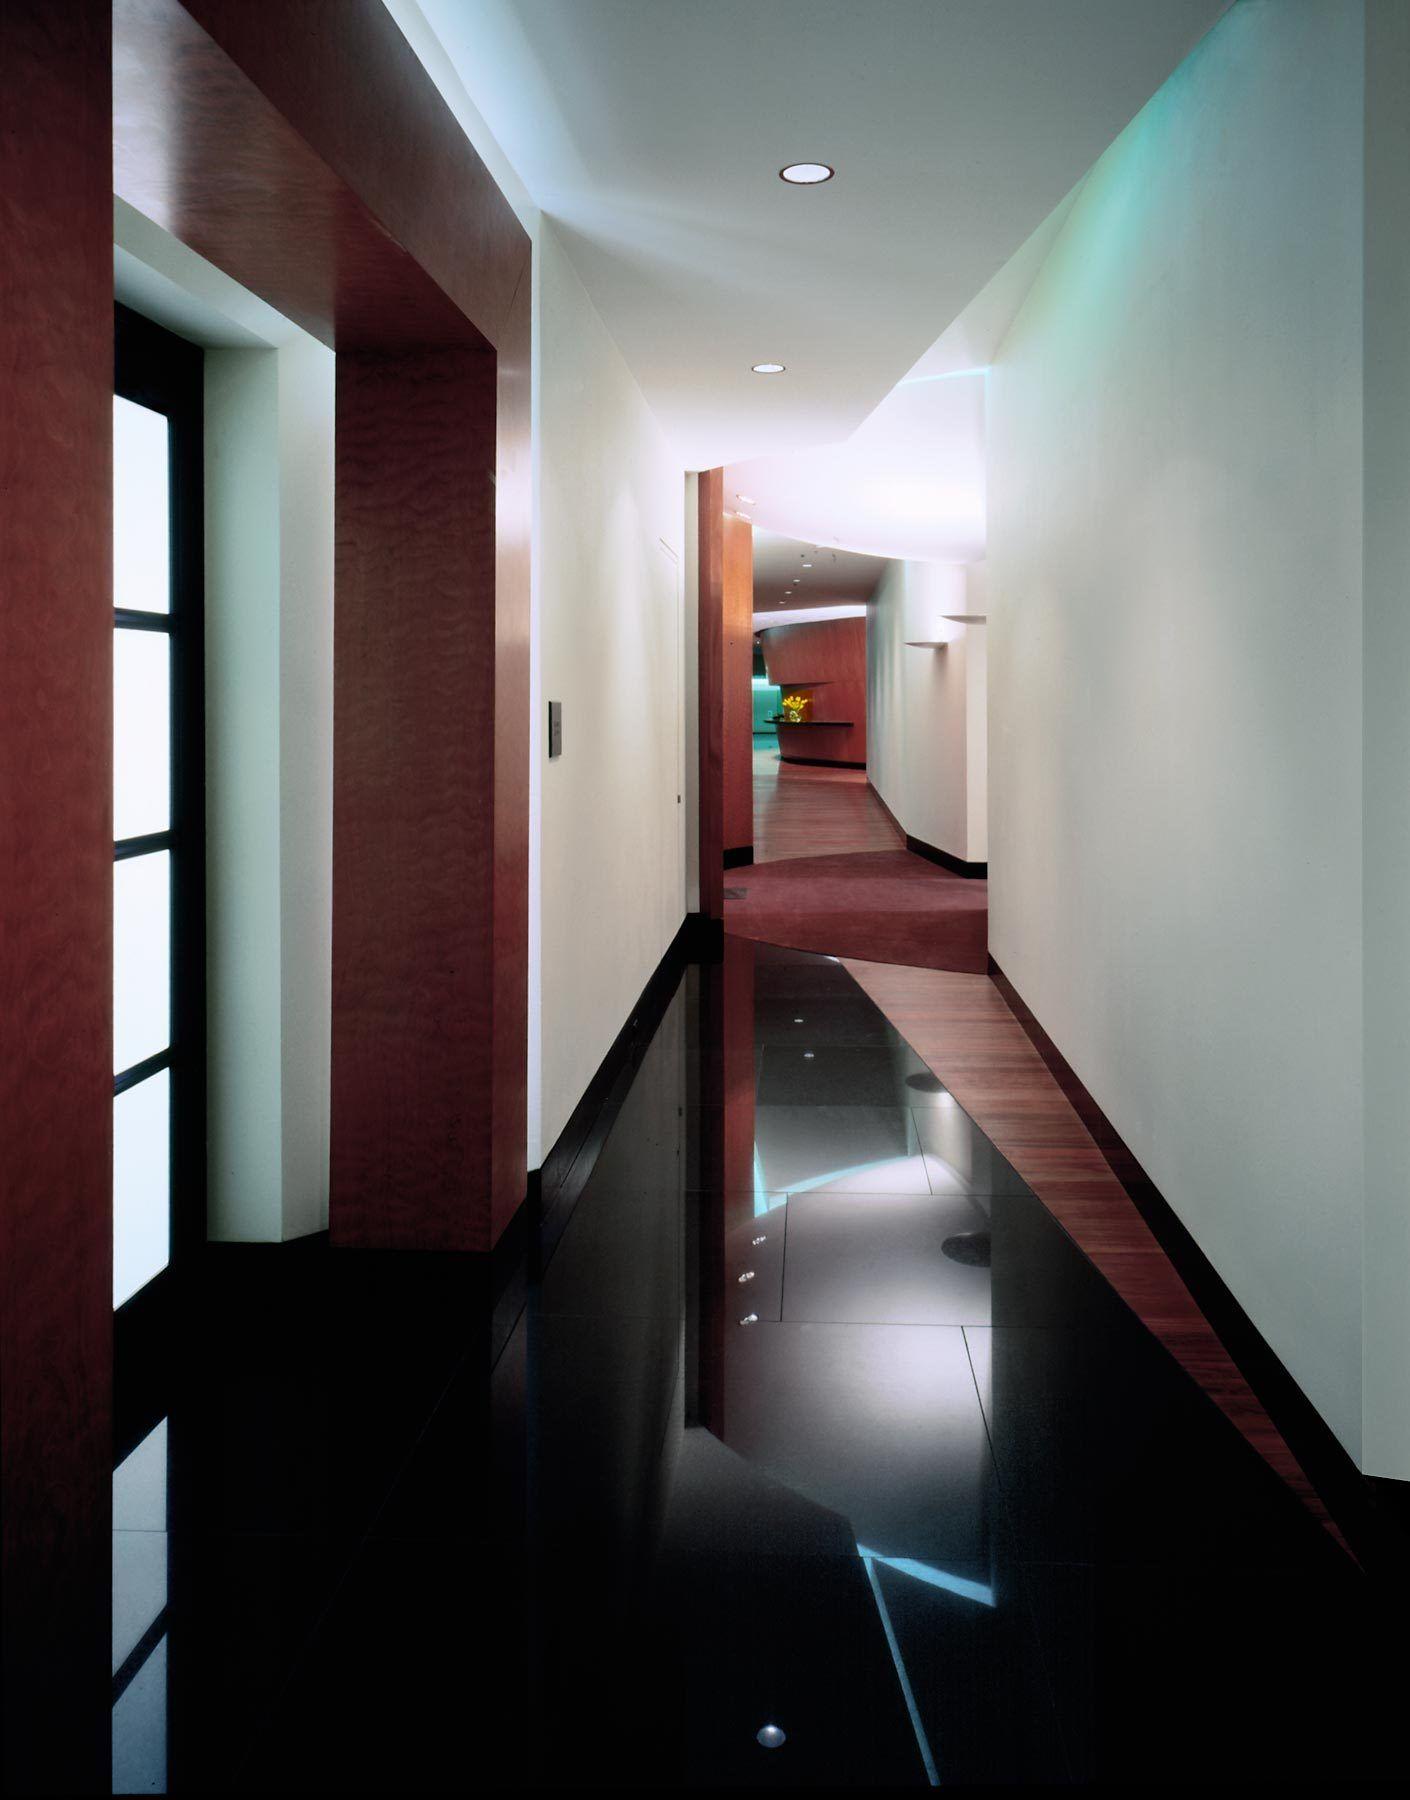 1at_t_hallway.jpg